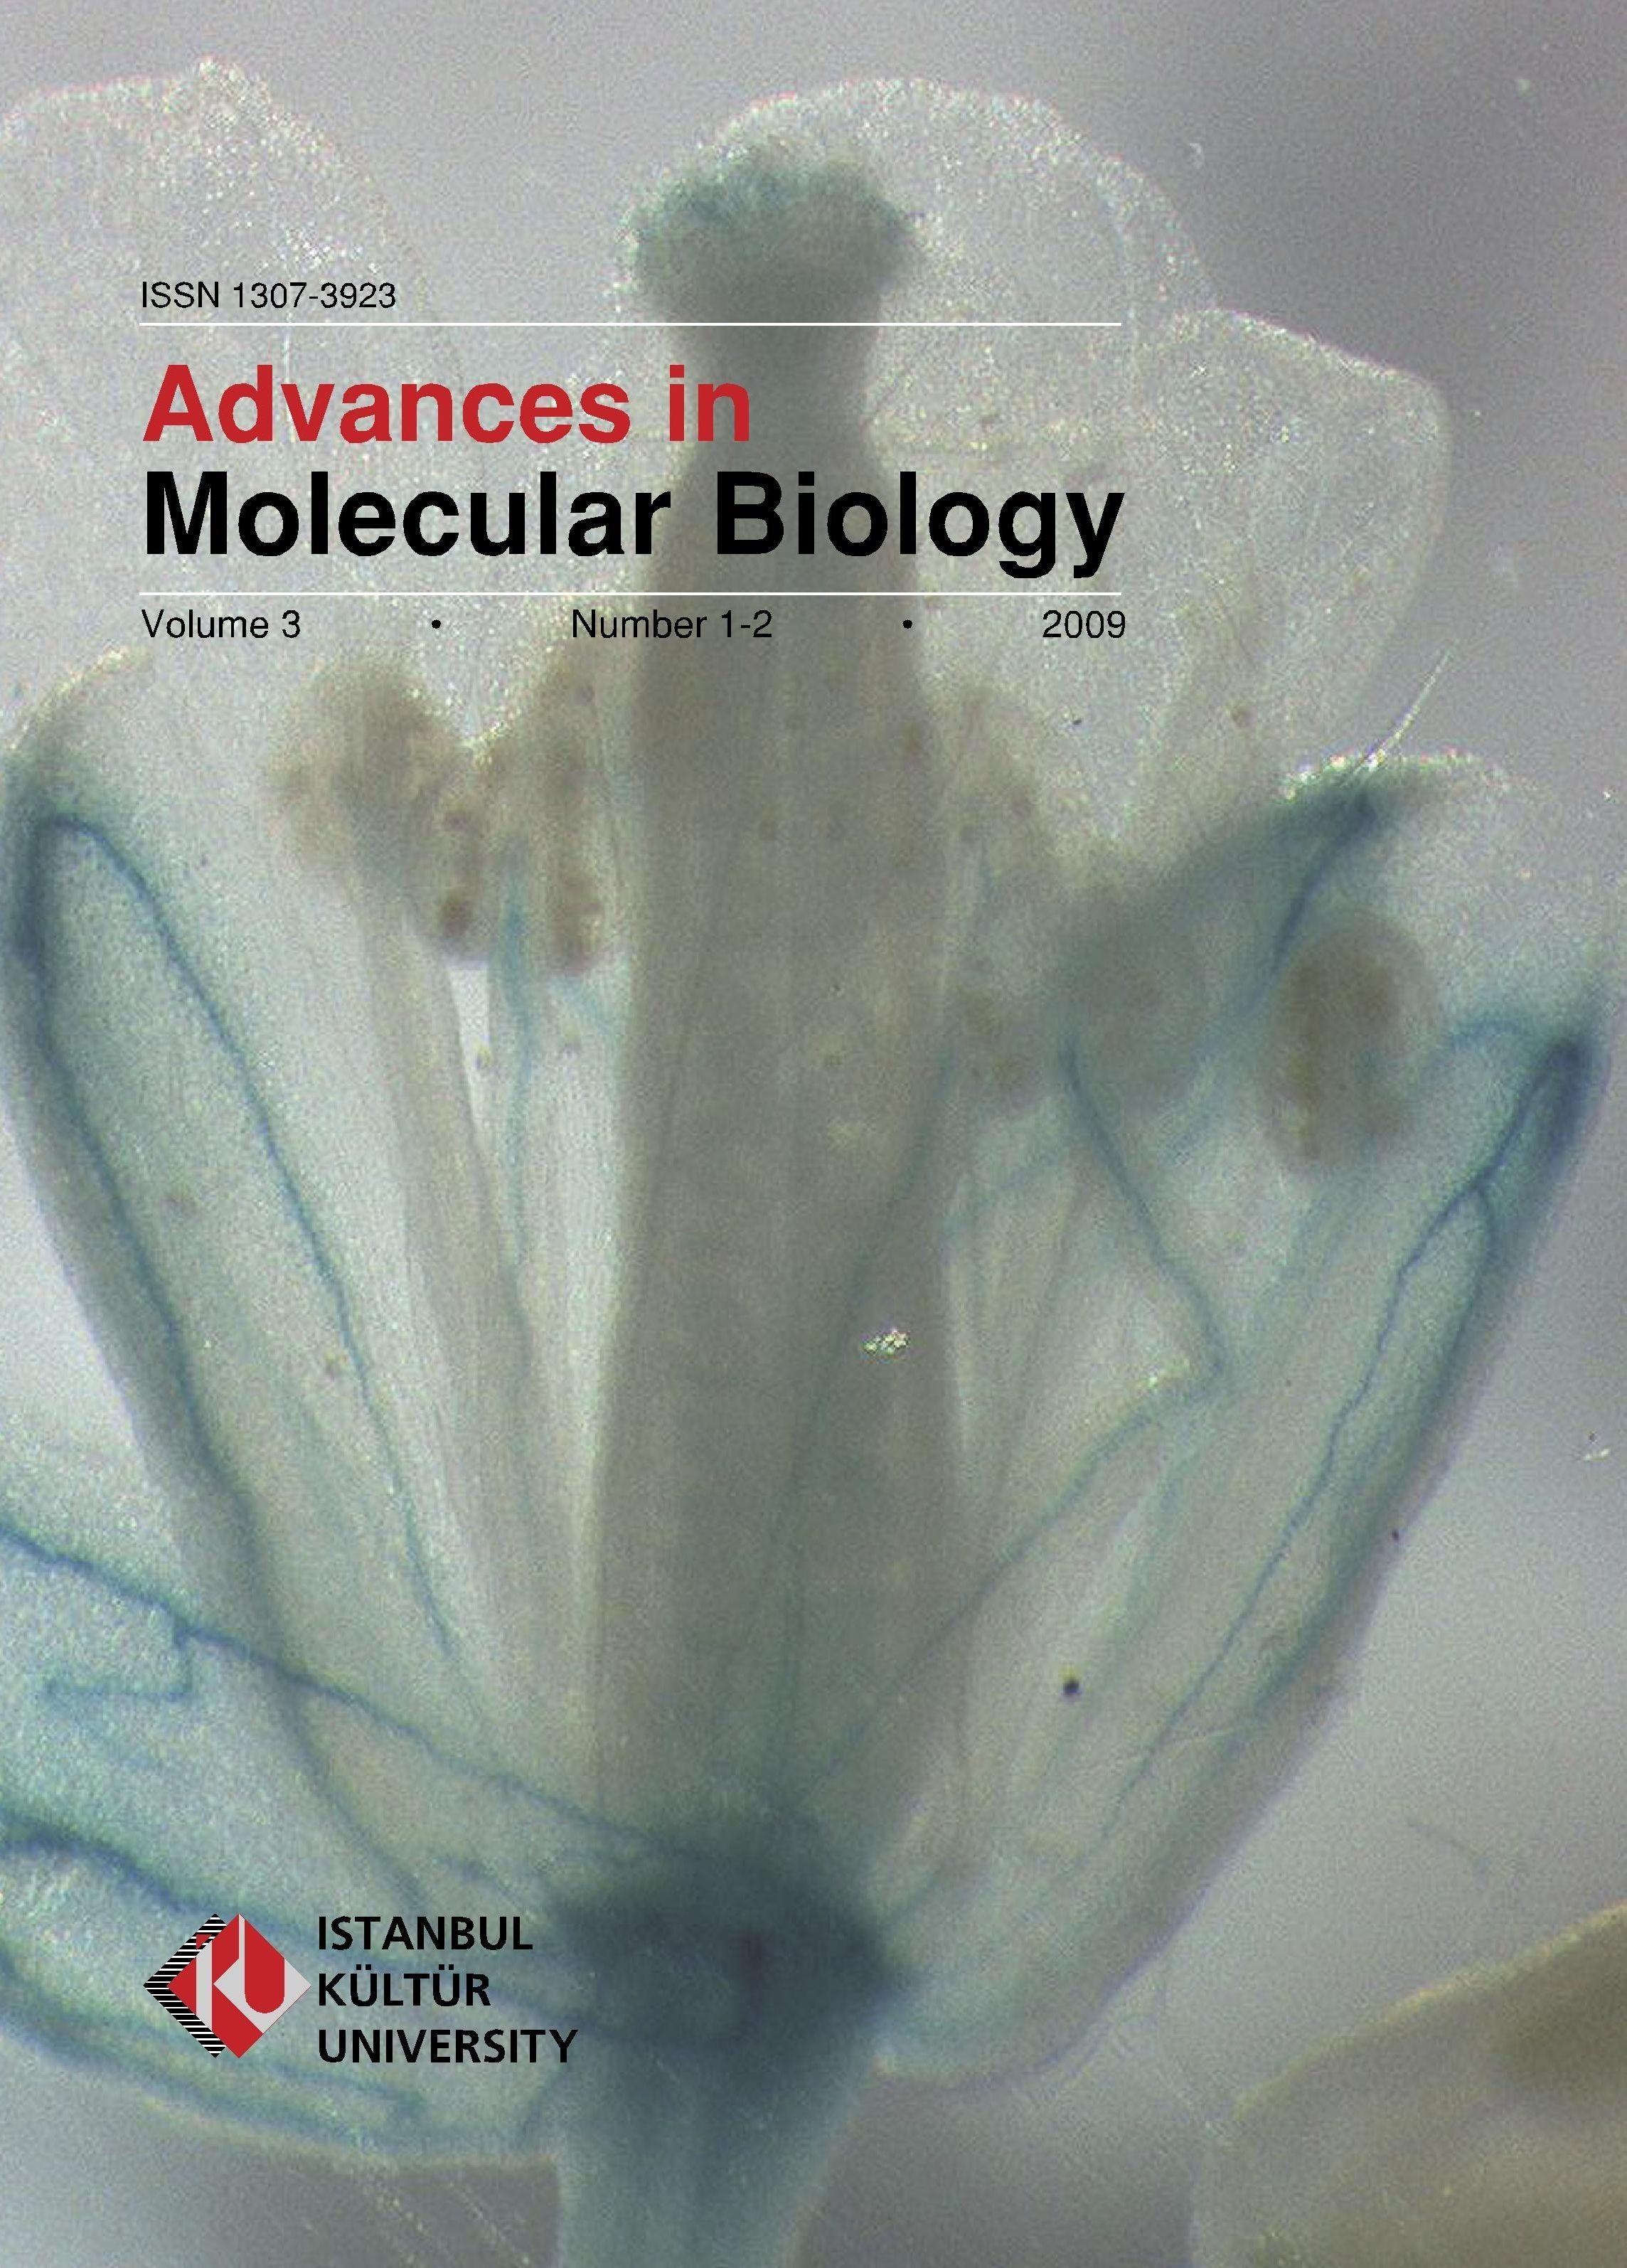 Advances In Molecular Biology Indexed By Eijasr Advances In